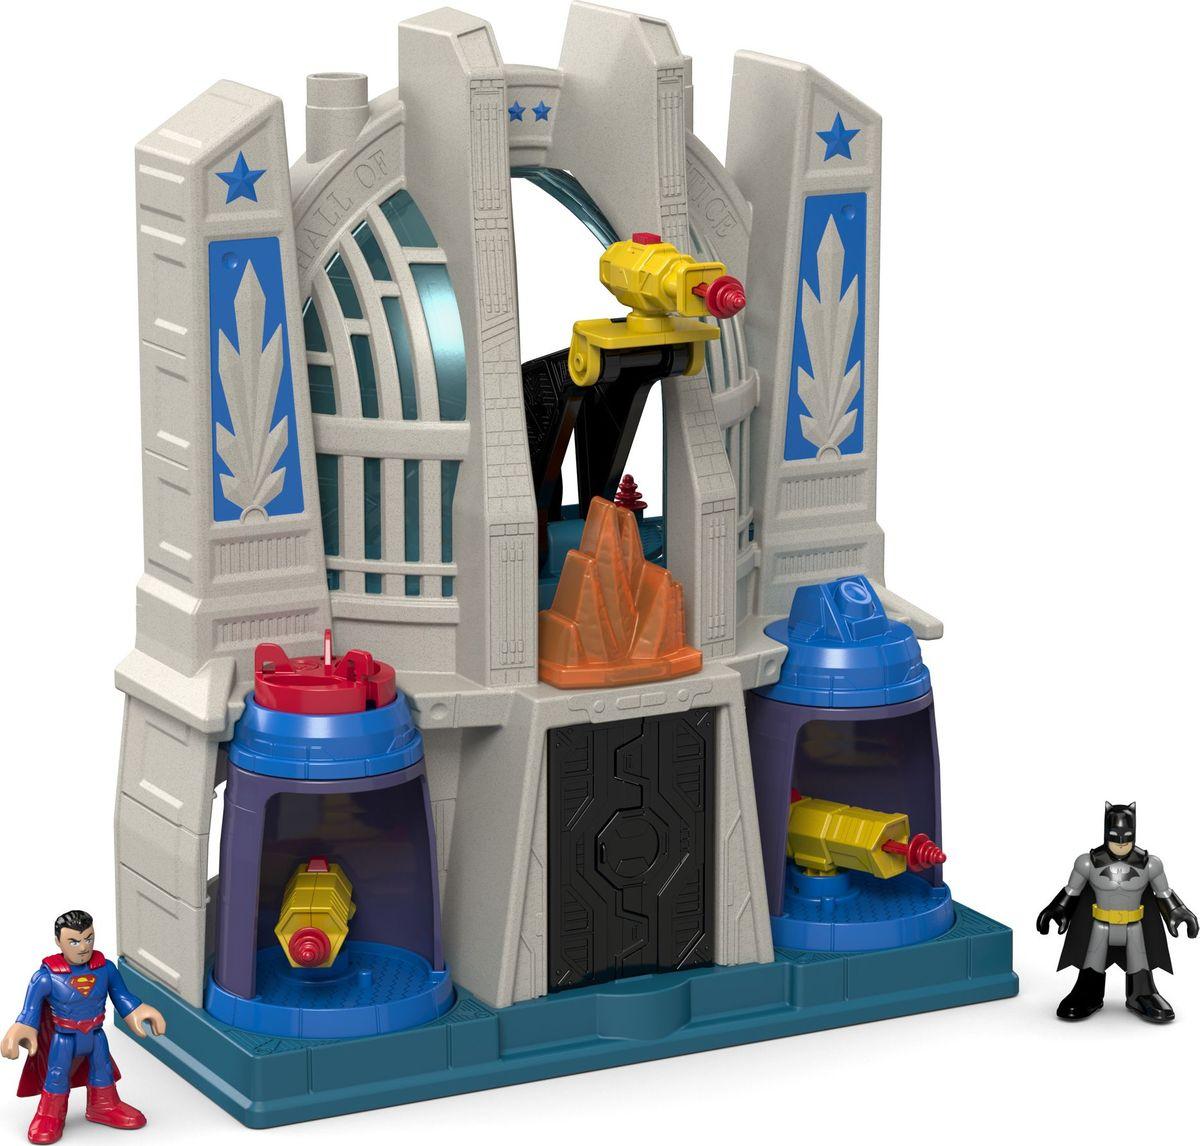 Imaginext Игровой набор DC Super Friends Hall of Justice